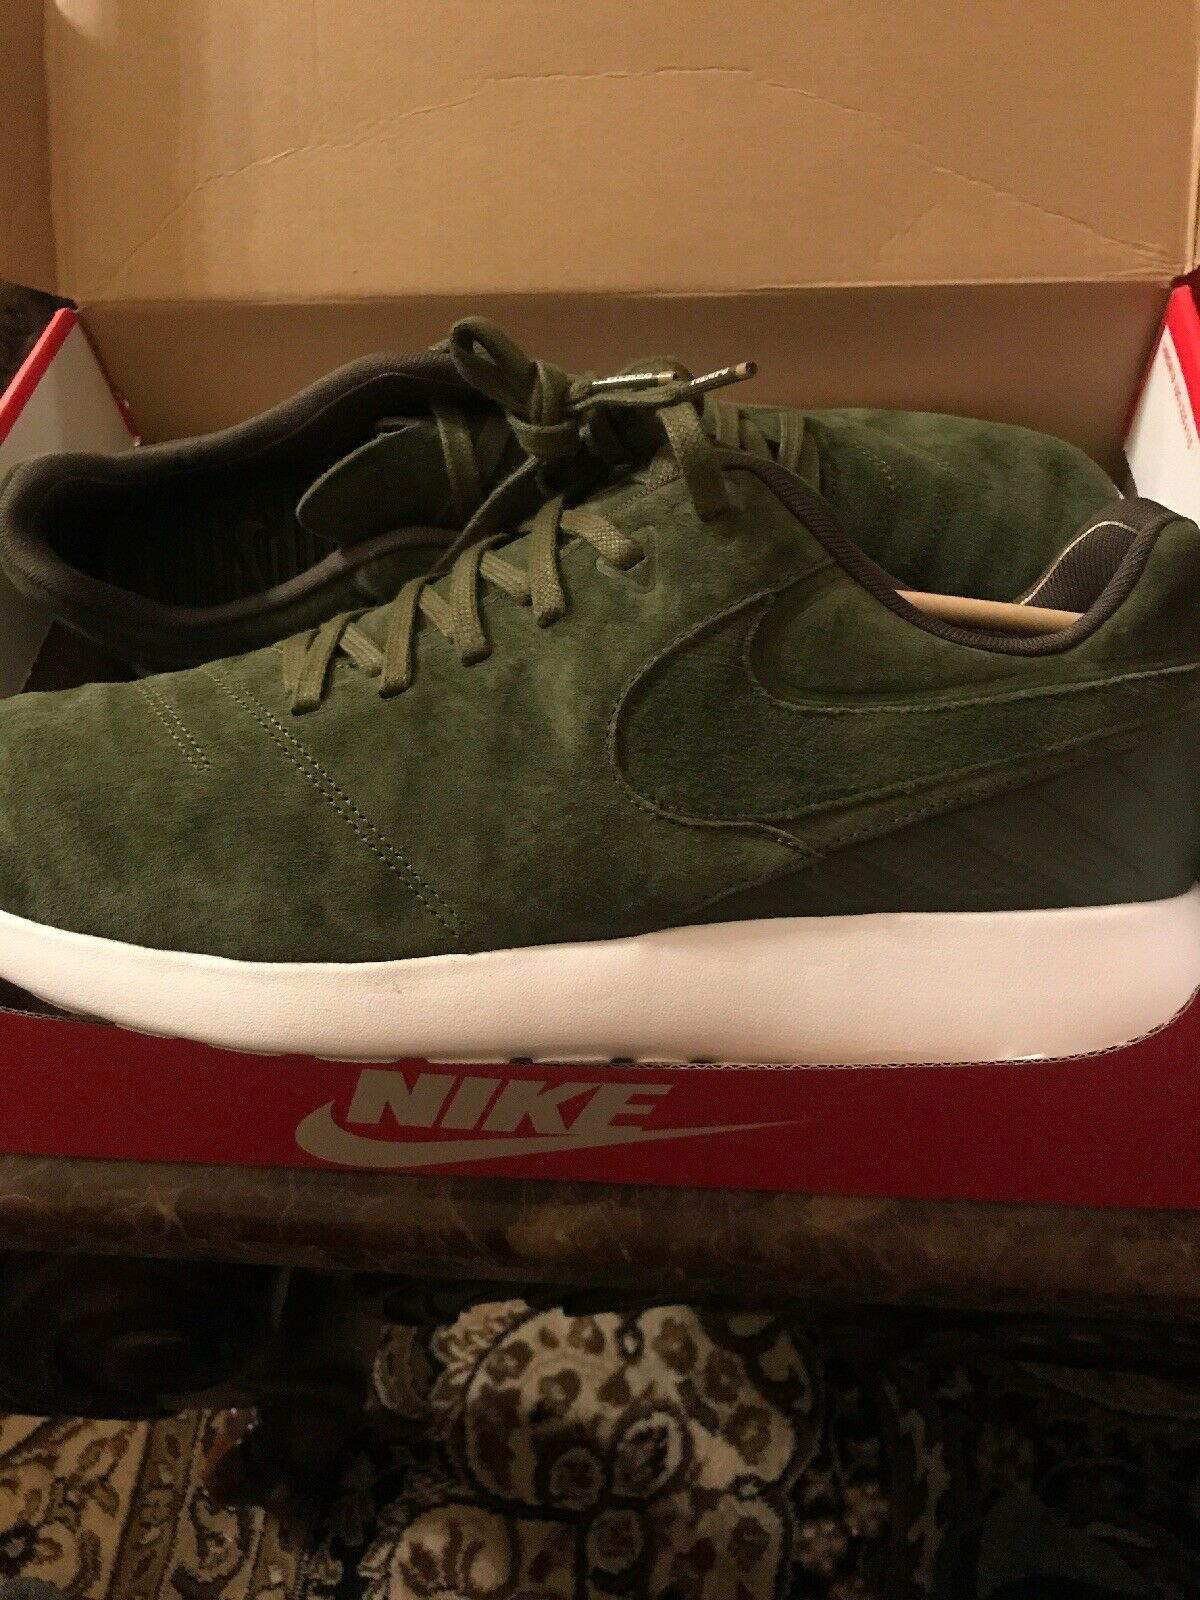 New in Box Nike Roshe Tiempo VI Legion Green Leather shoes 852615 300 - Size 12